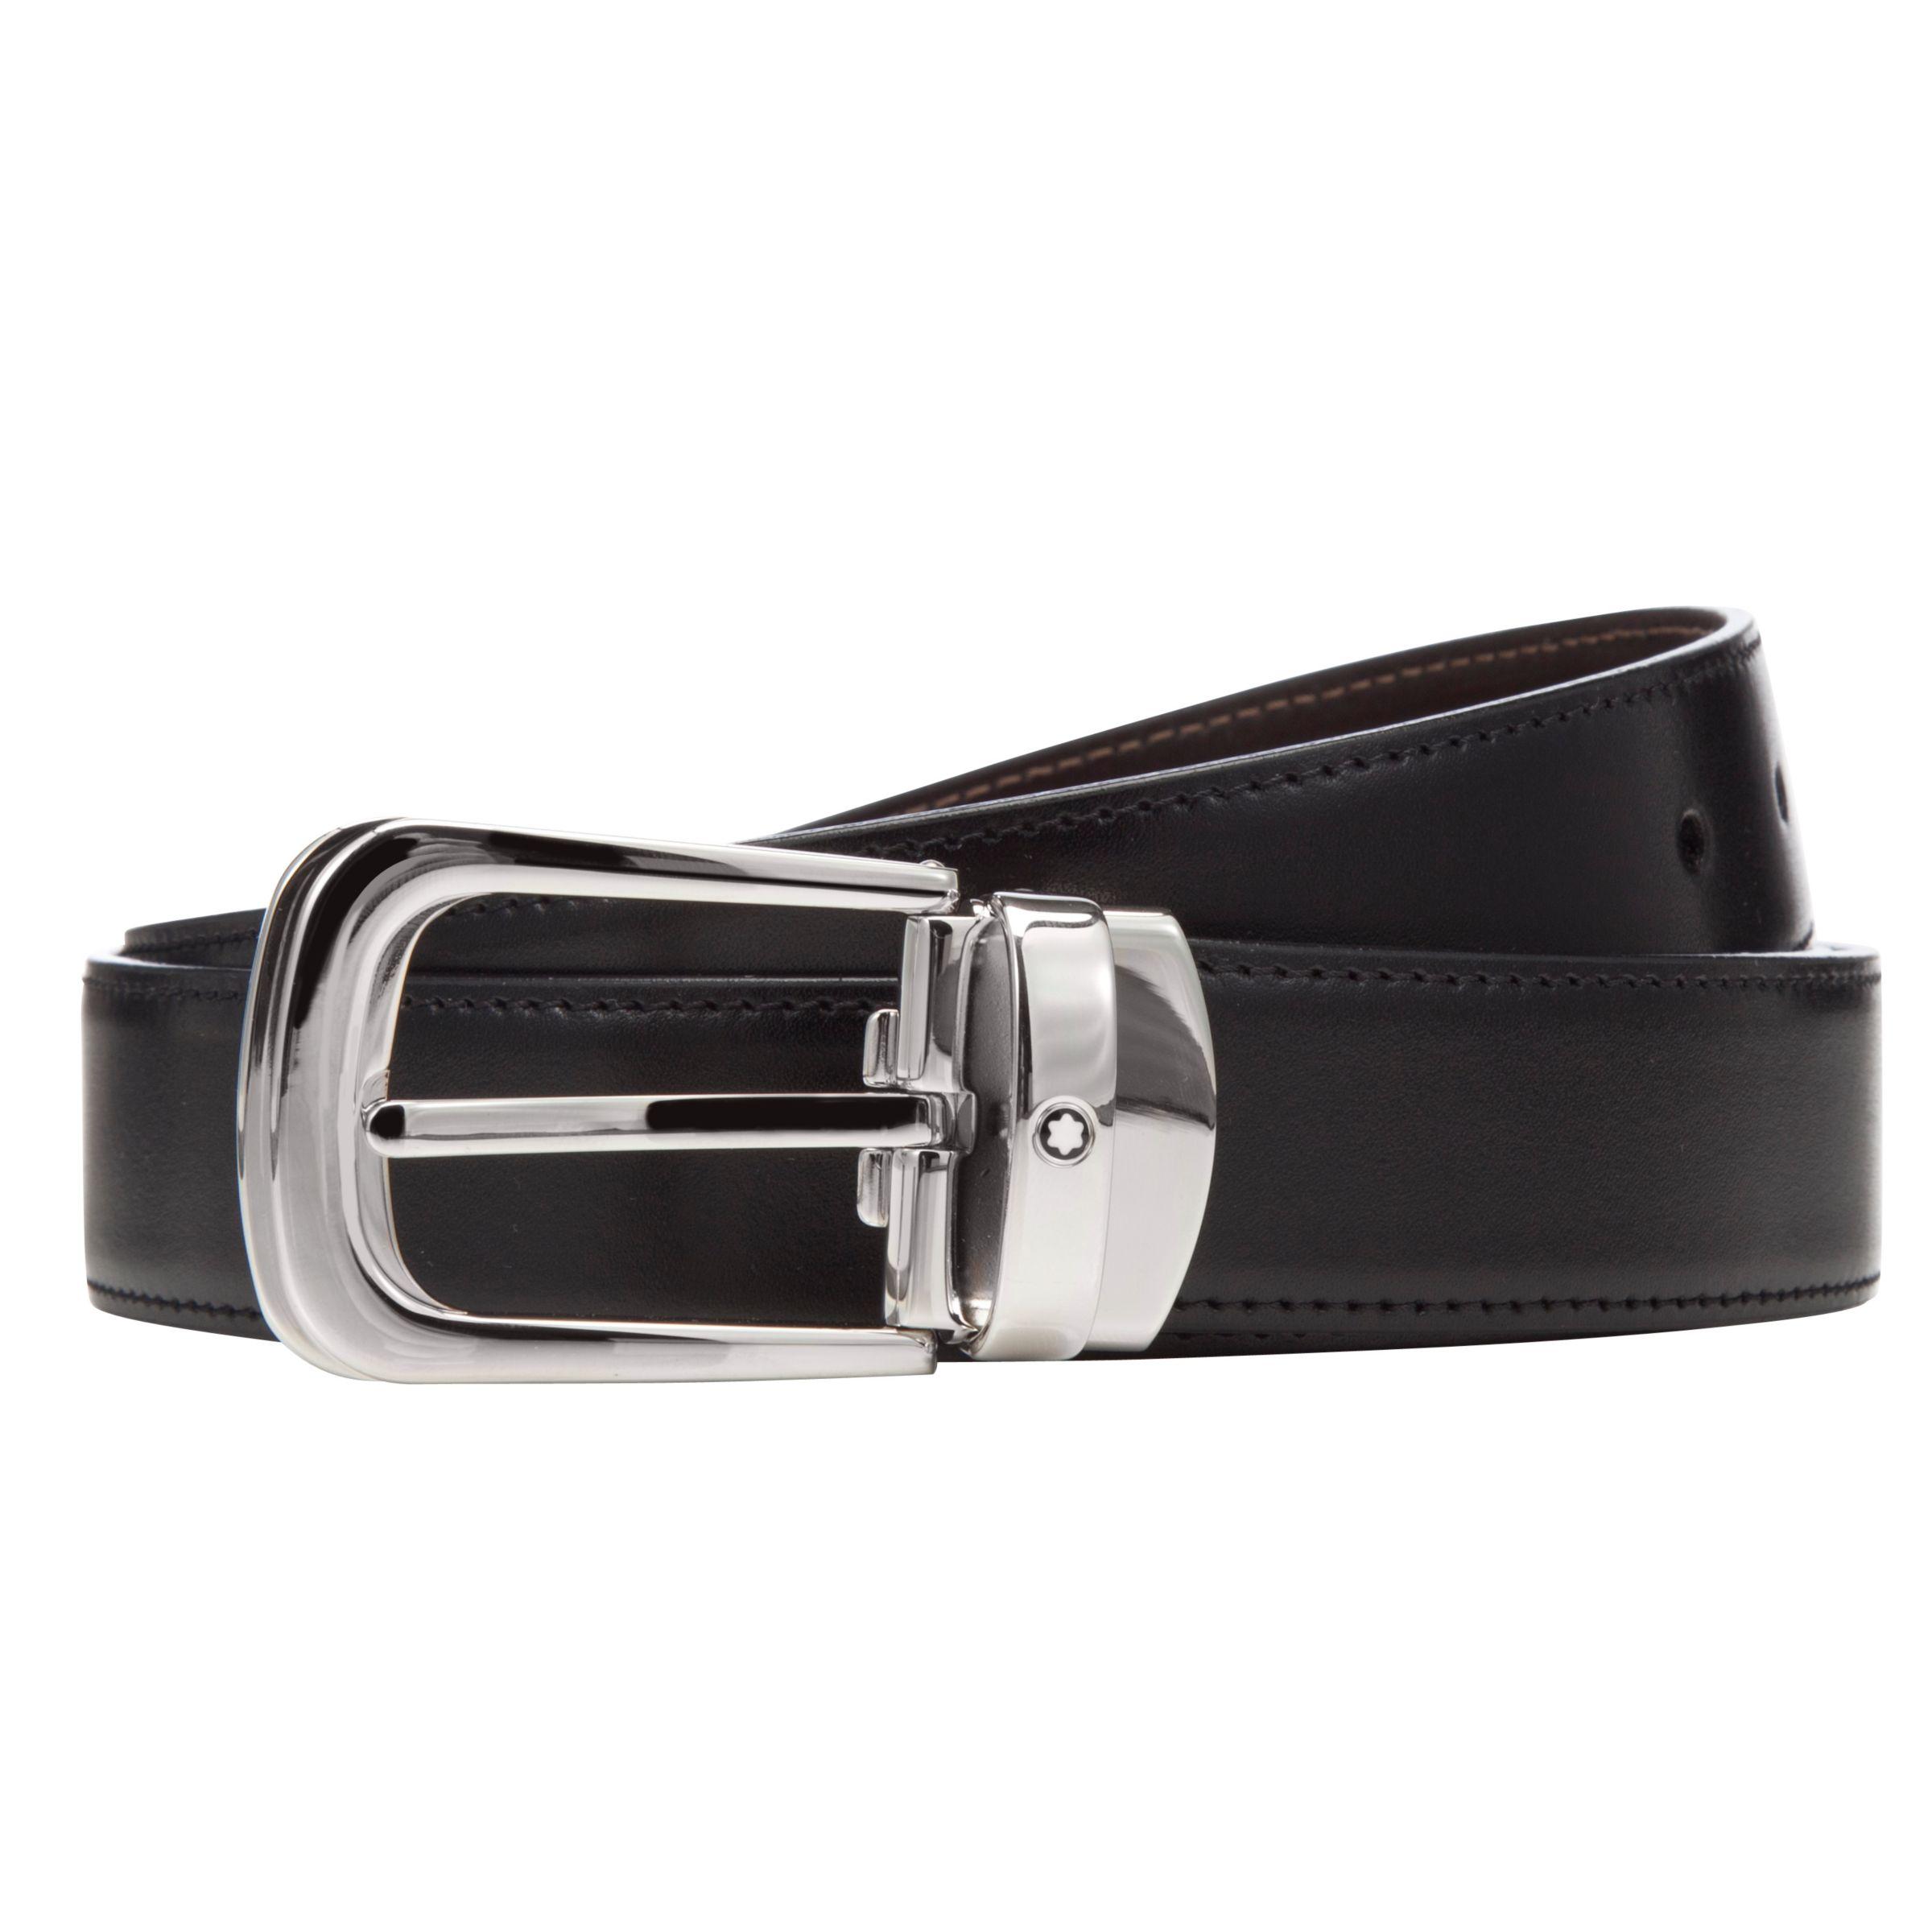 Montblanc Montblanc Reversible Leather Belt With Palladium Horseshoe Buckle, One Size, Black/Brown